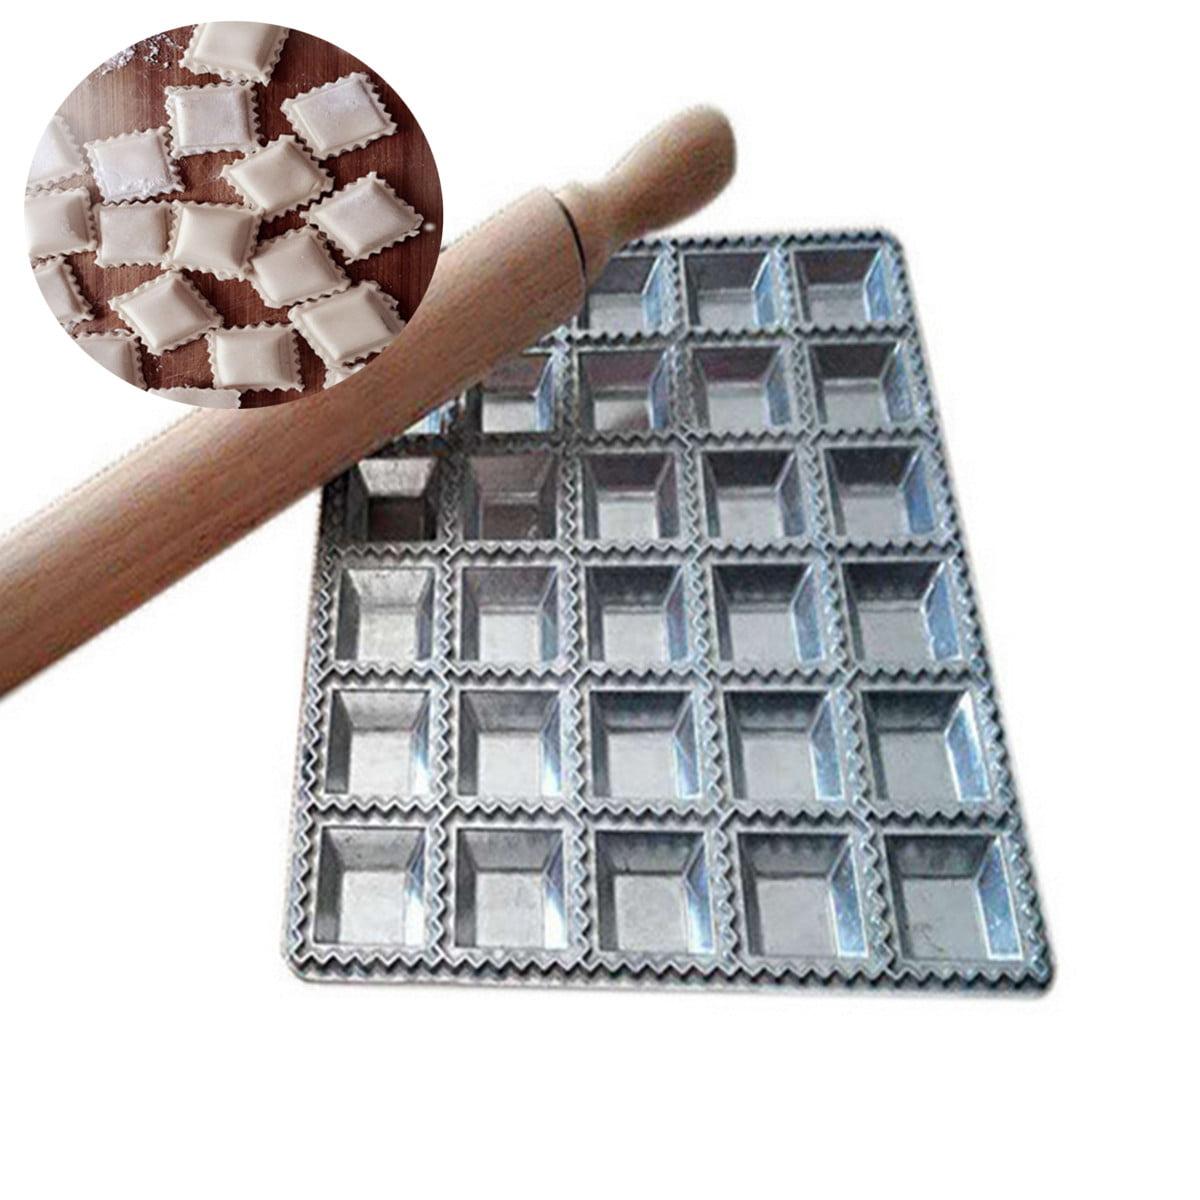 DIY Ravioli Maker Gadgets Press Pasta Dough Dumpling Mold Kitchen Tool Silver by